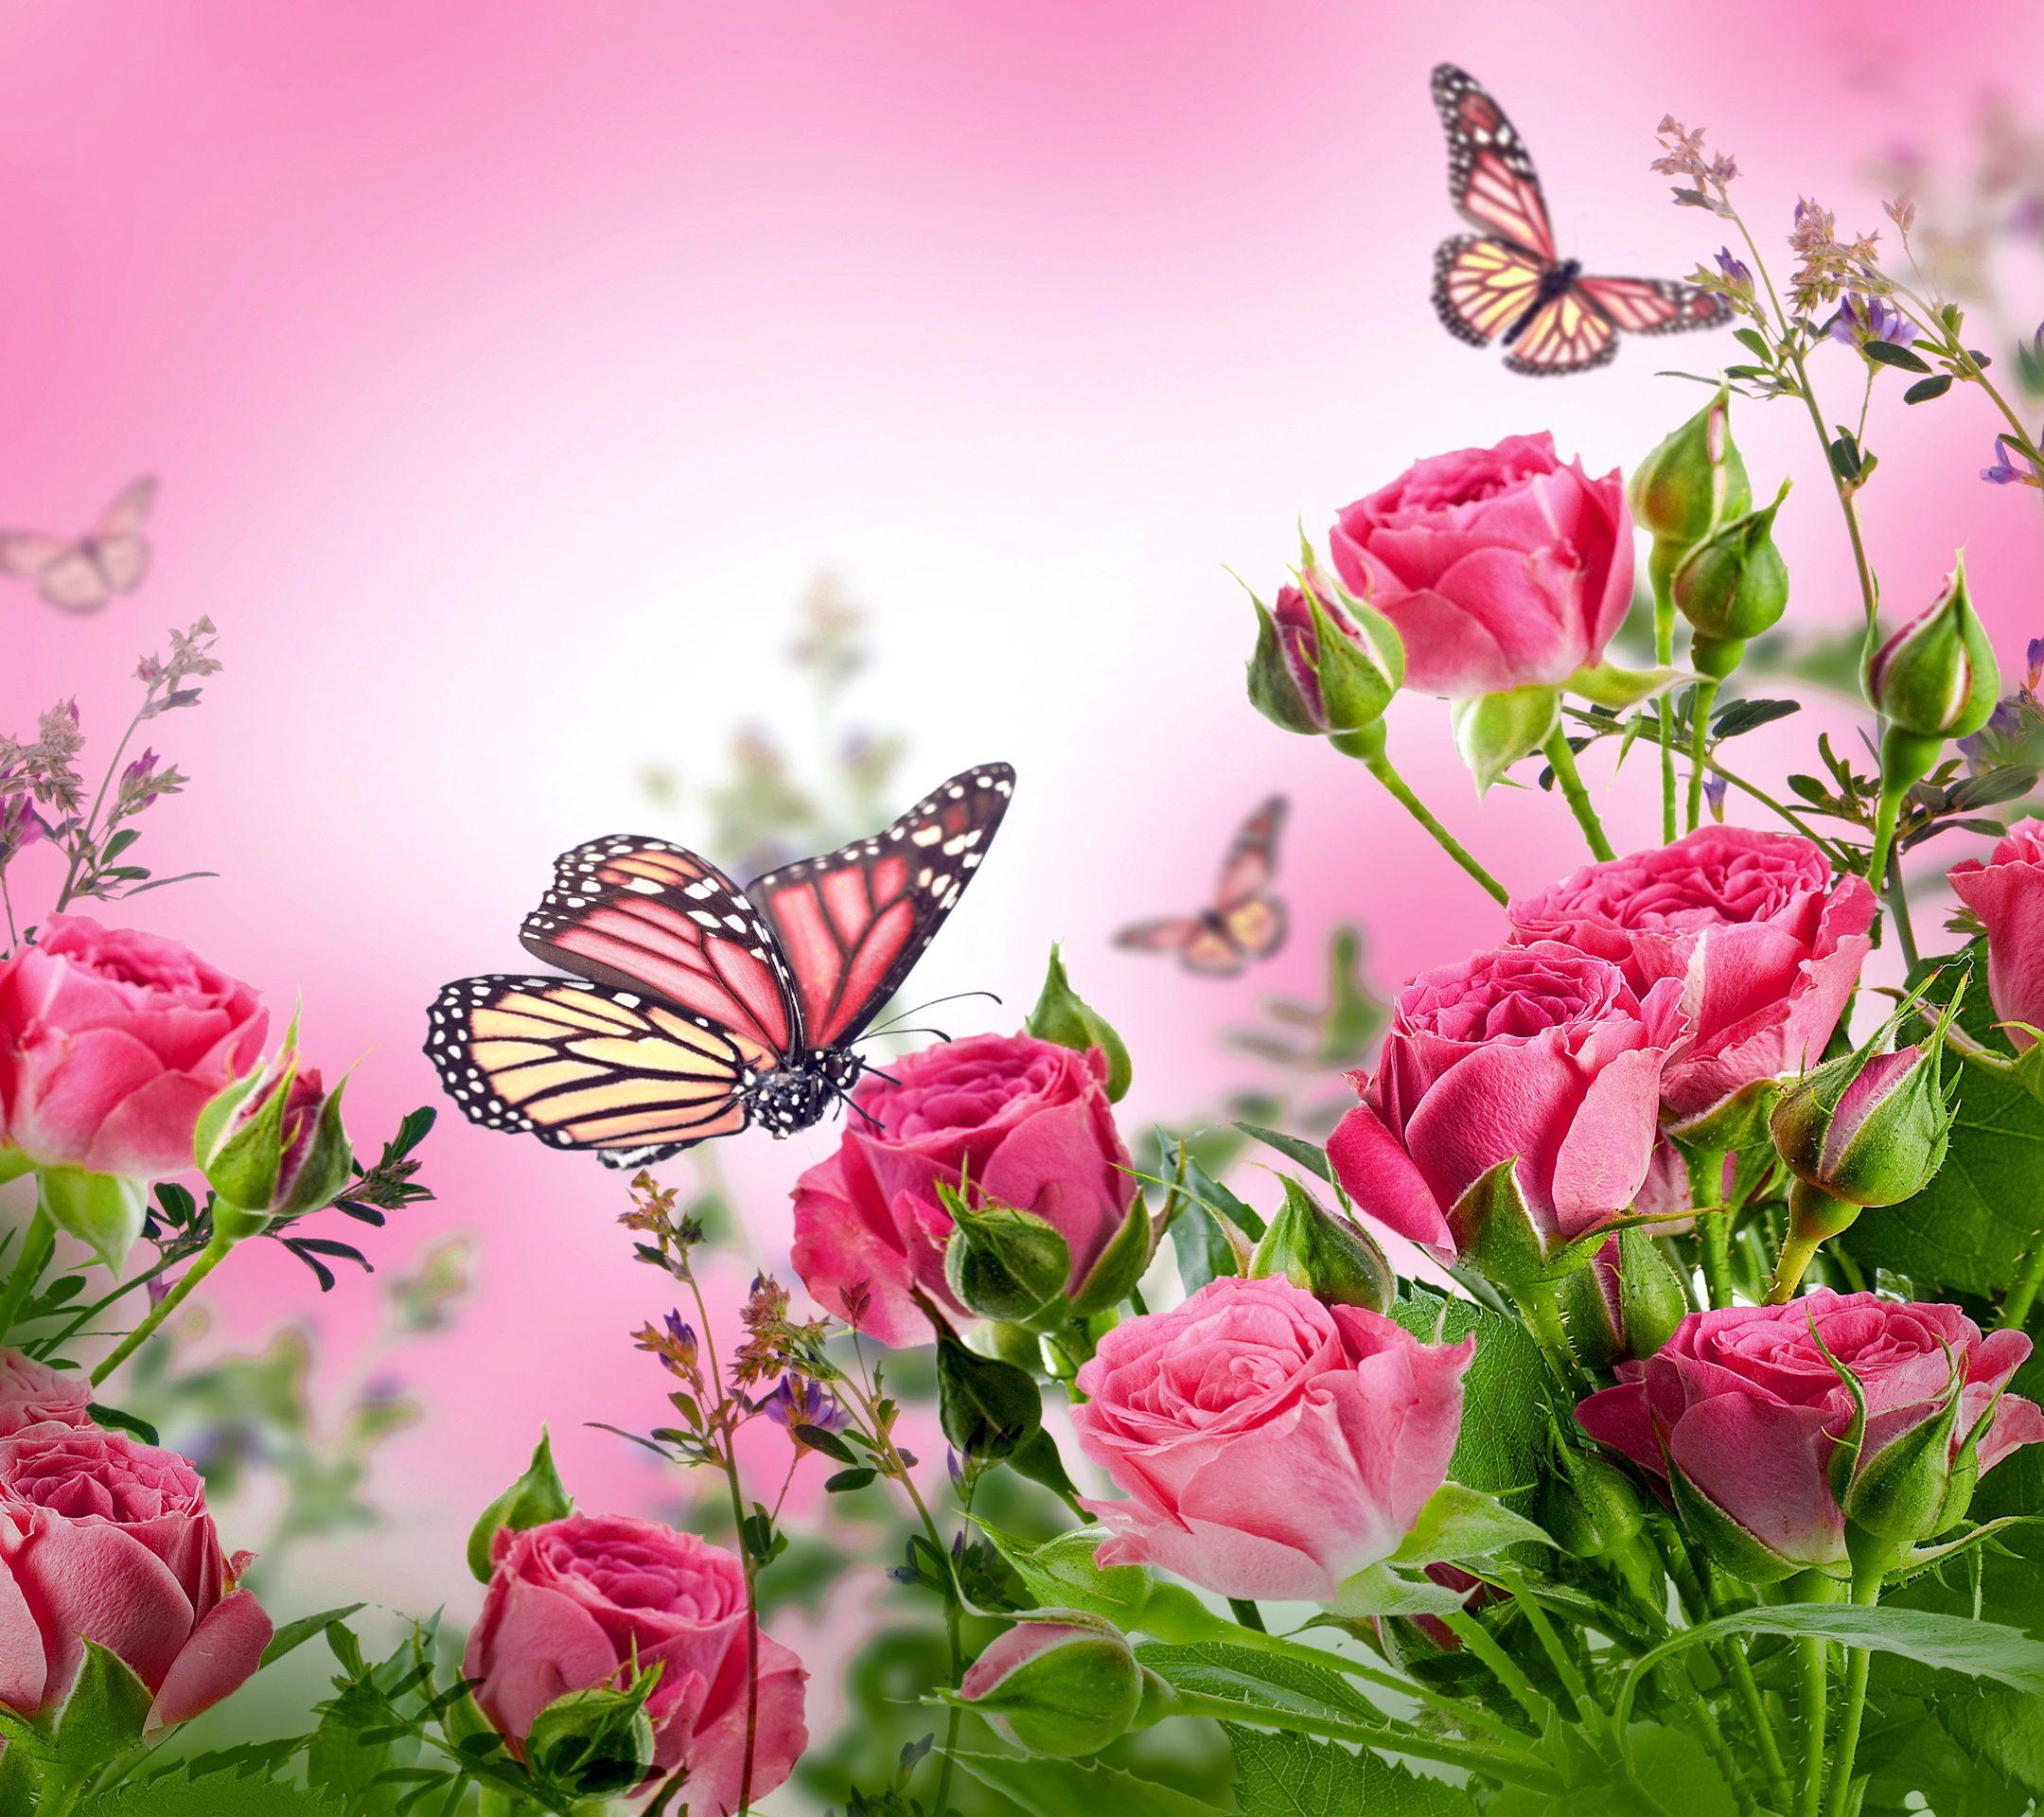 Pink Butterfly Wallpaper: Butterflies Desktop Background Wallpaper Free